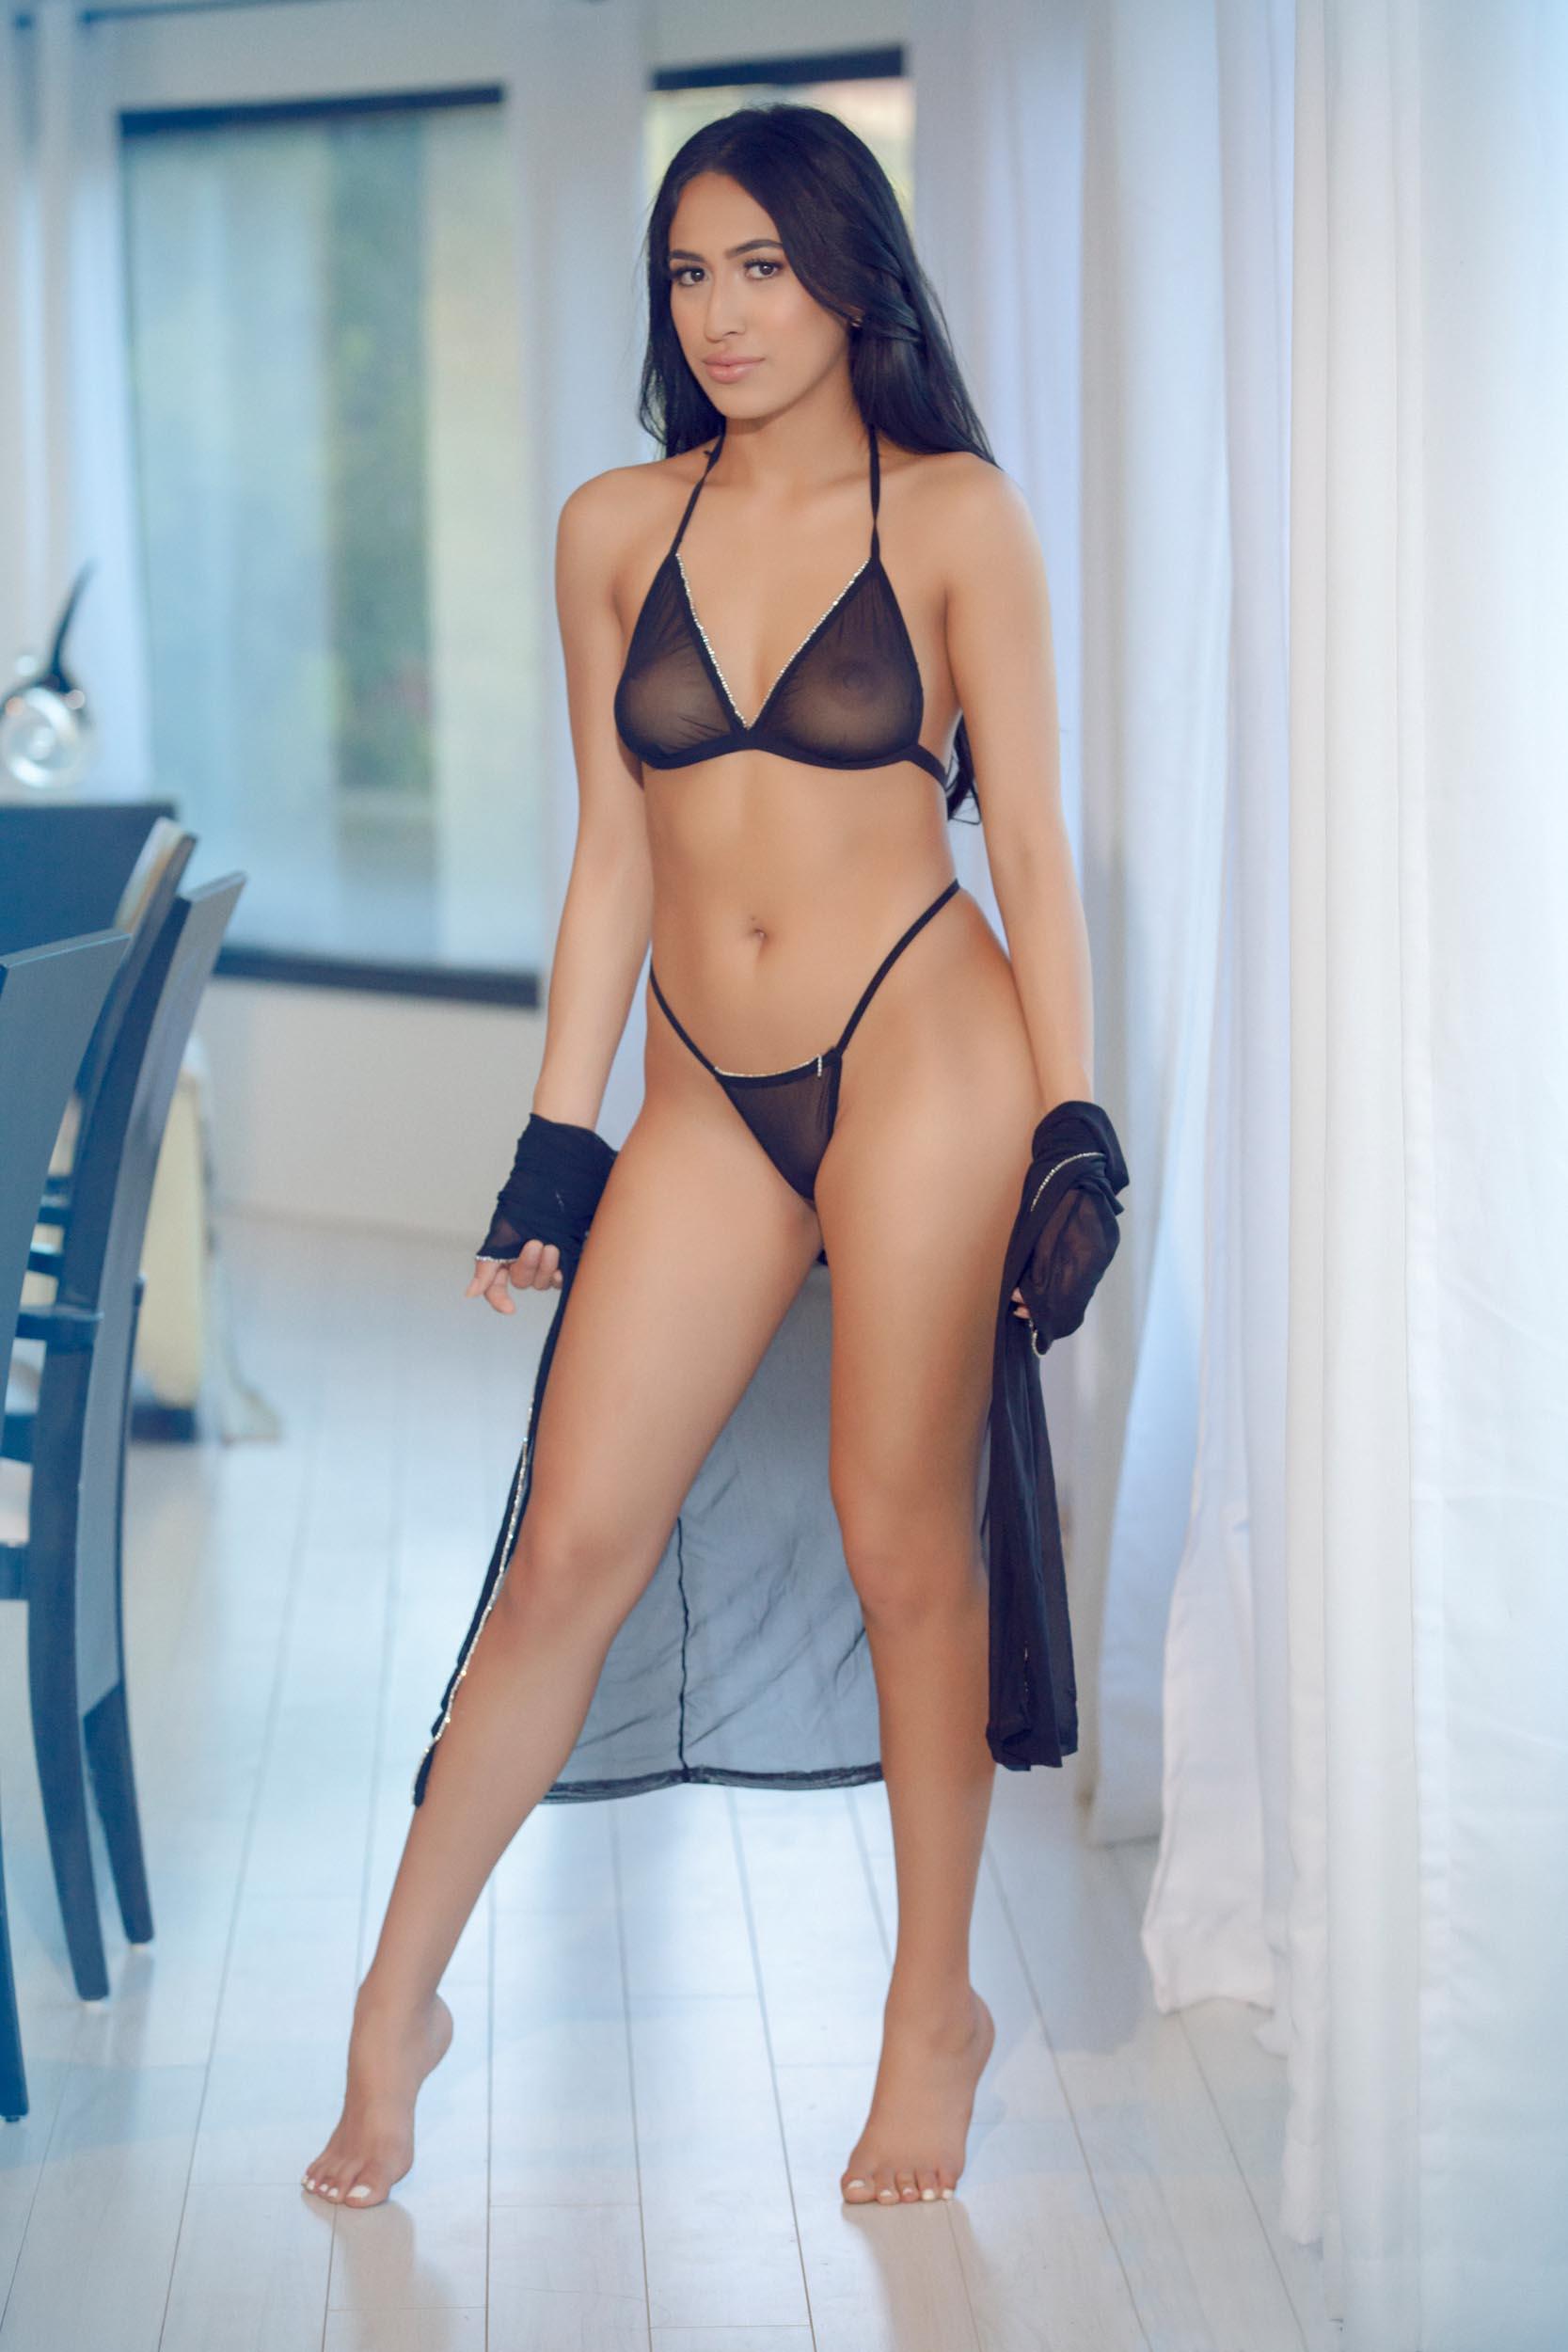 Aubrey Nova Porn Video edible aubrey - hussie models